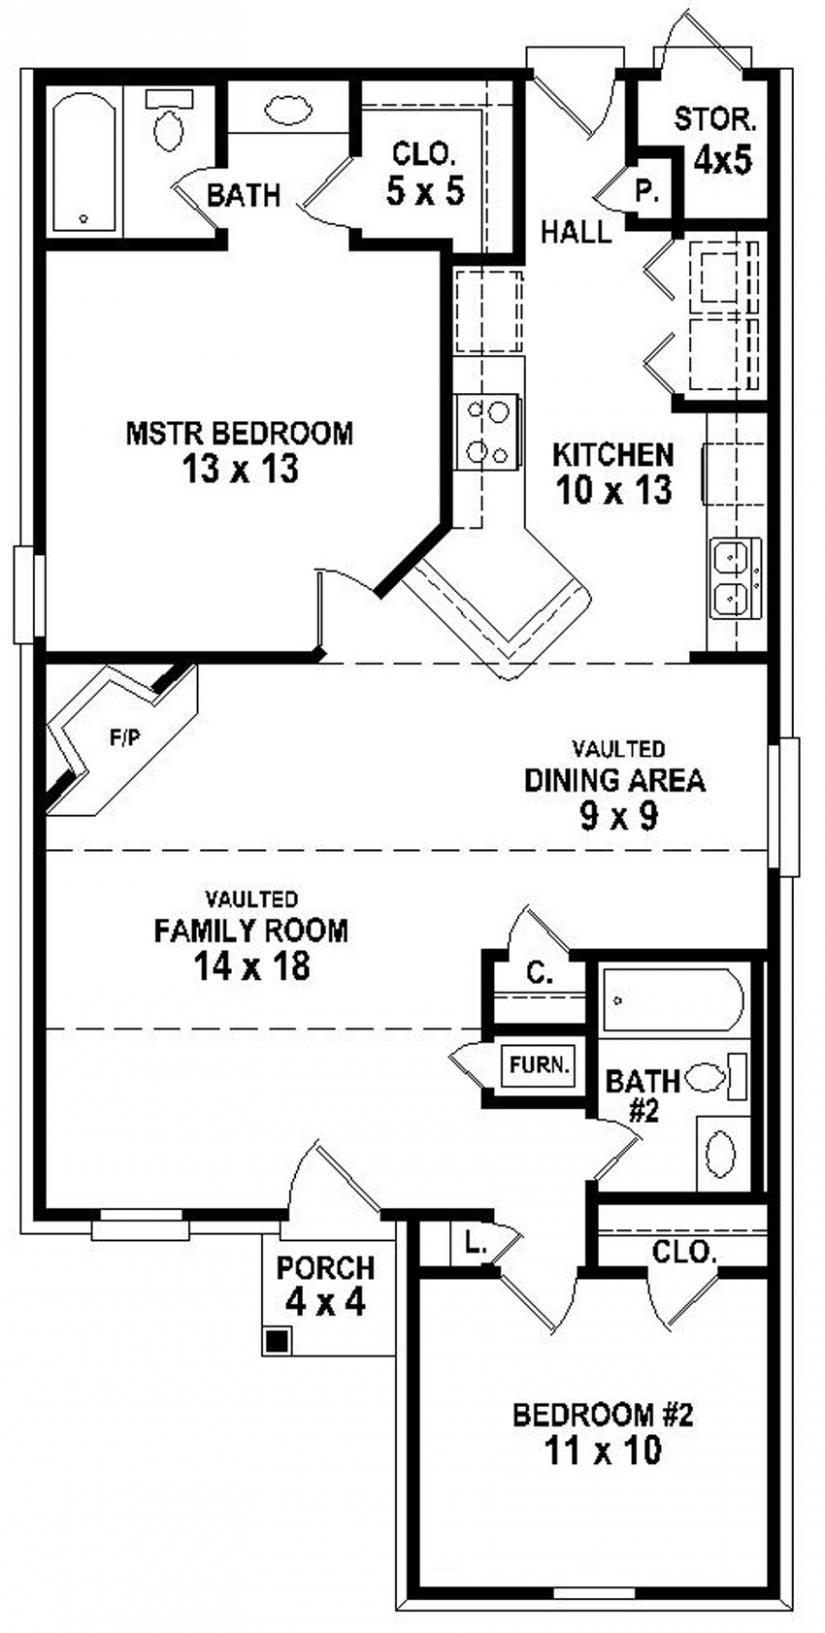 654334 simple 2 bedroom 2 bath house plan house plans floor plans - Simple House Plans